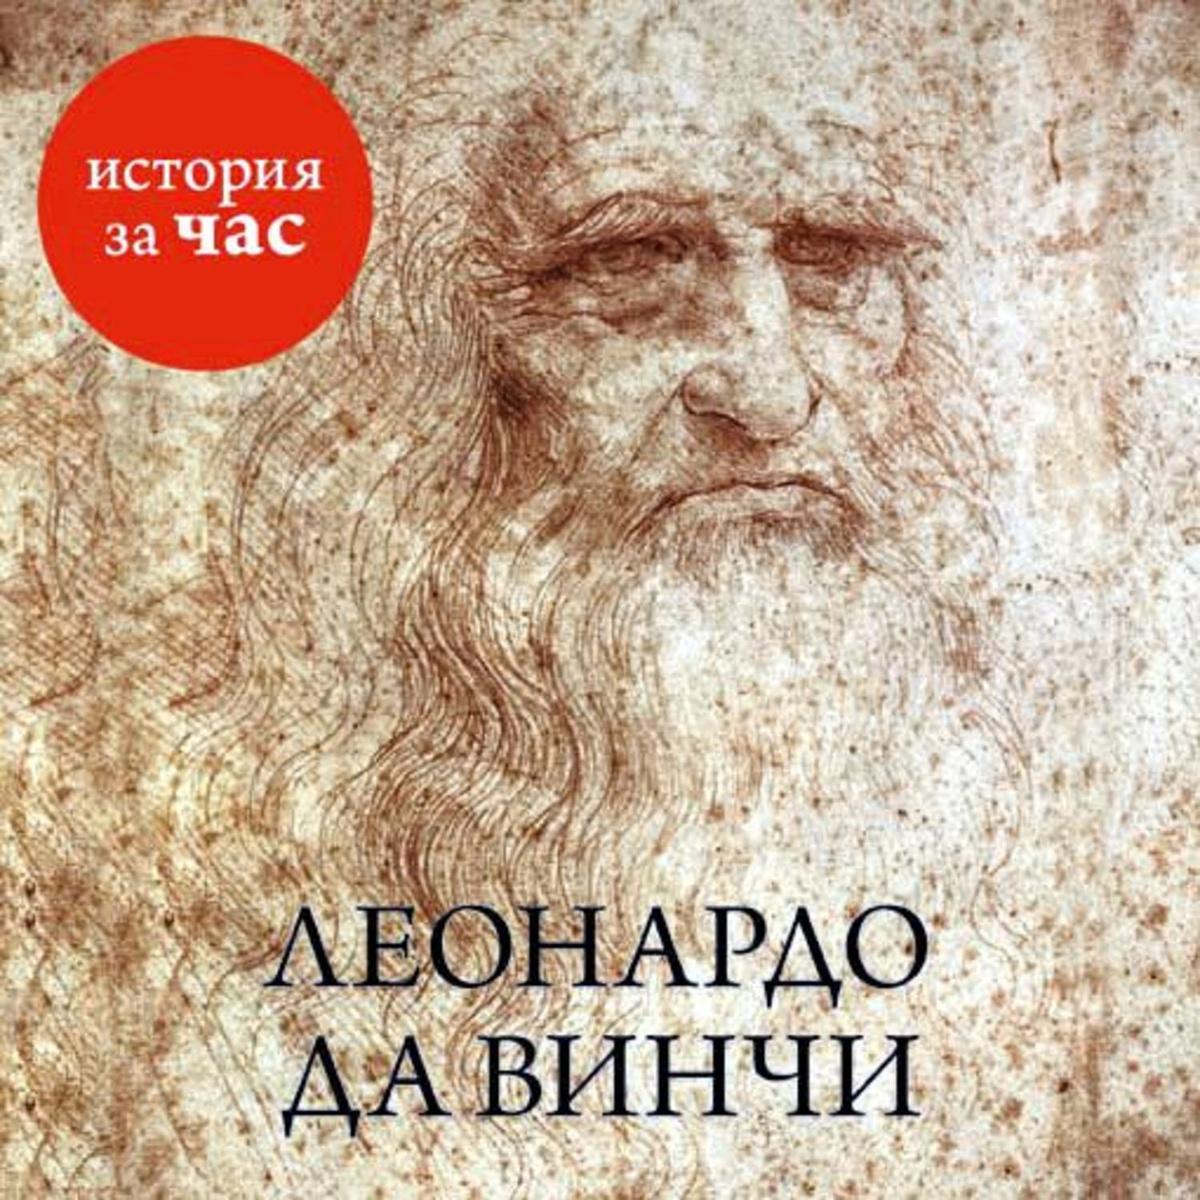 Леонардо да Винчи   Калмыкова Вера Николаевна #1